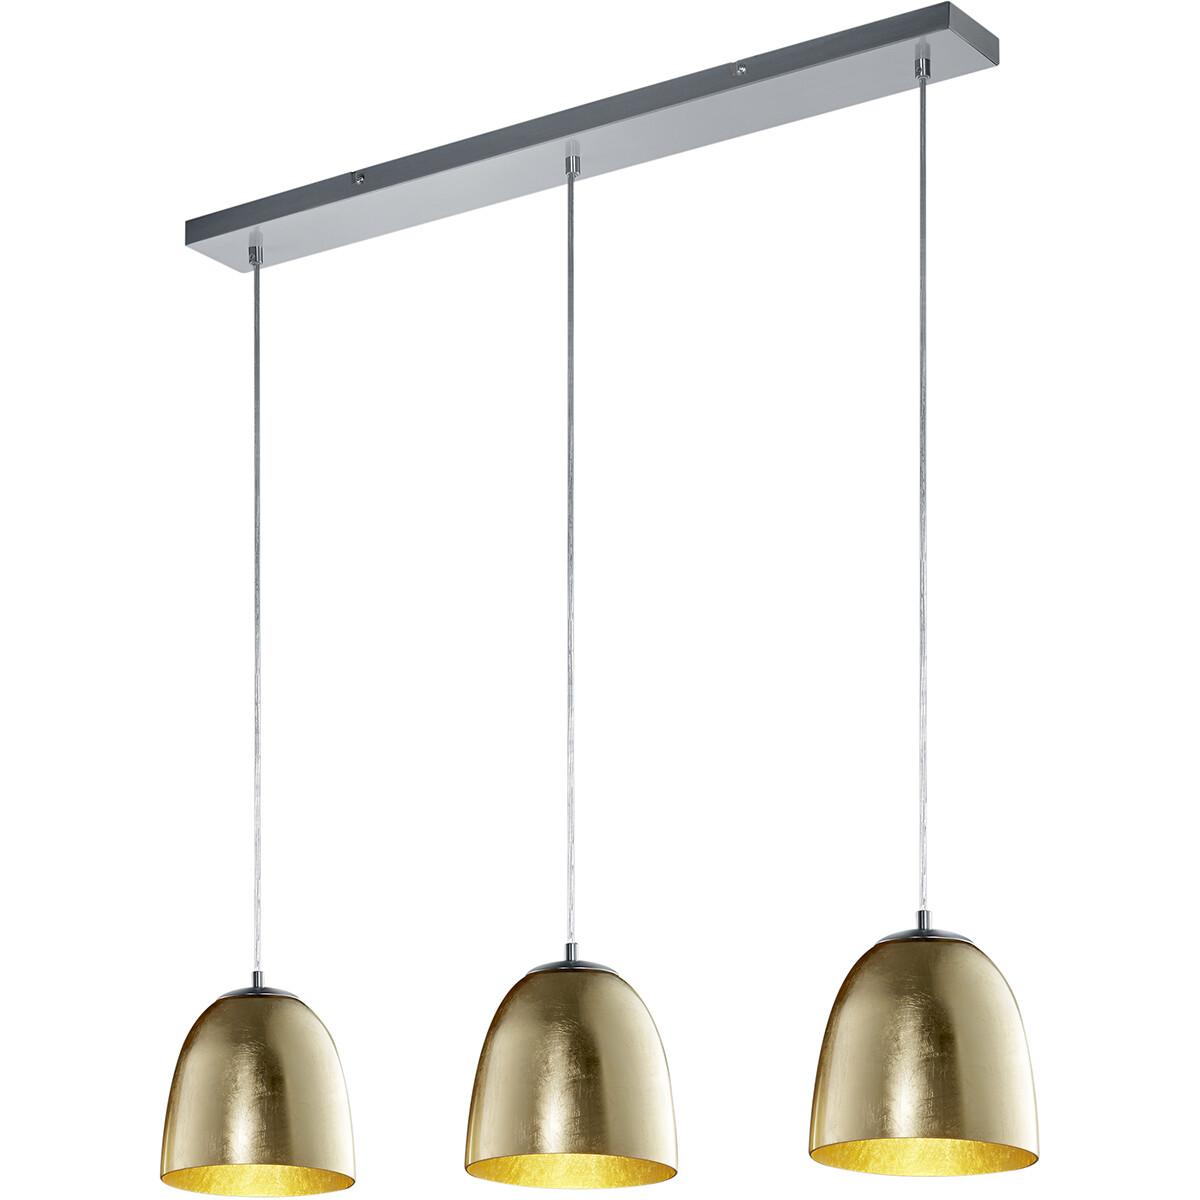 LED Hanglamp - Hangverlichting - Trion Onutia - E14 Fitting - 3-lichts - Rechthoek - Mat Goud - Alum